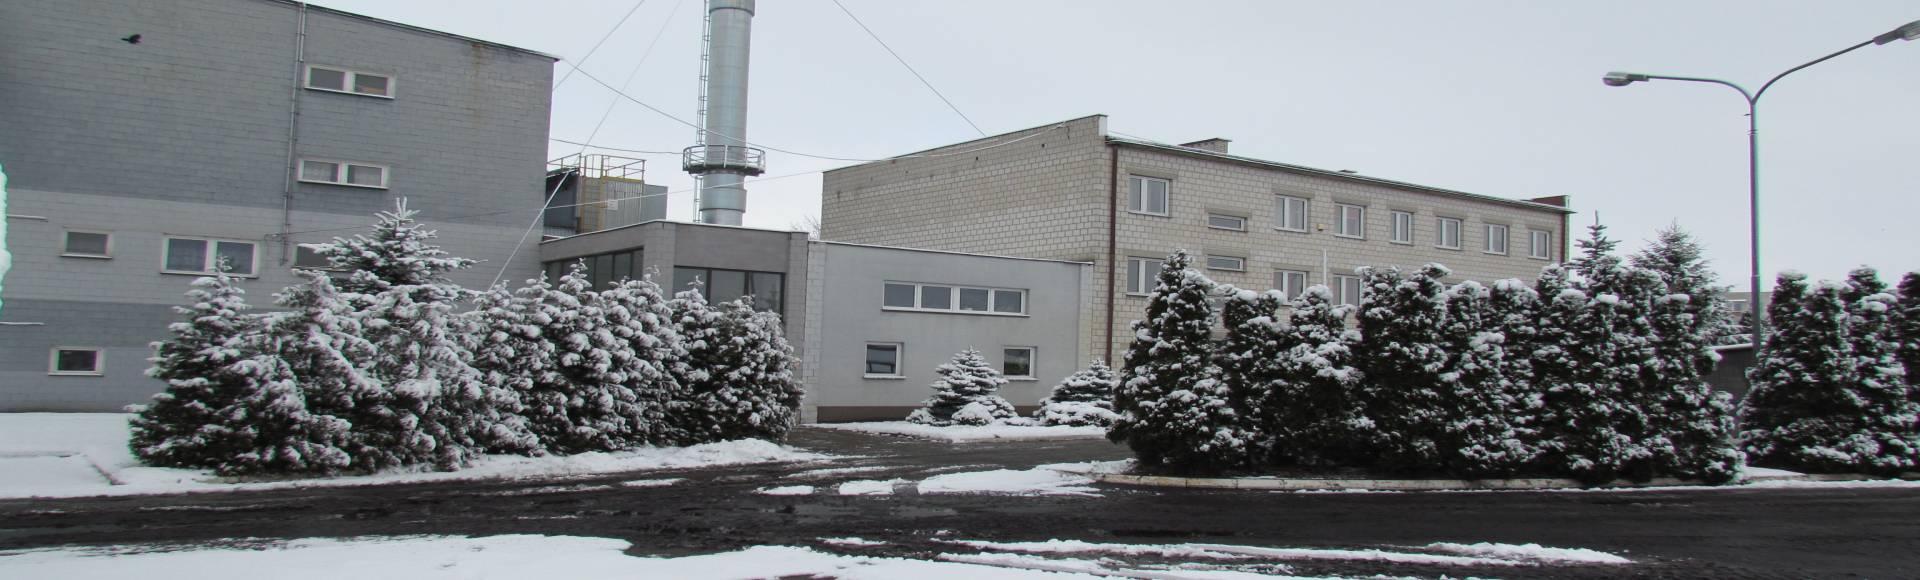 P.E.C. Zimą